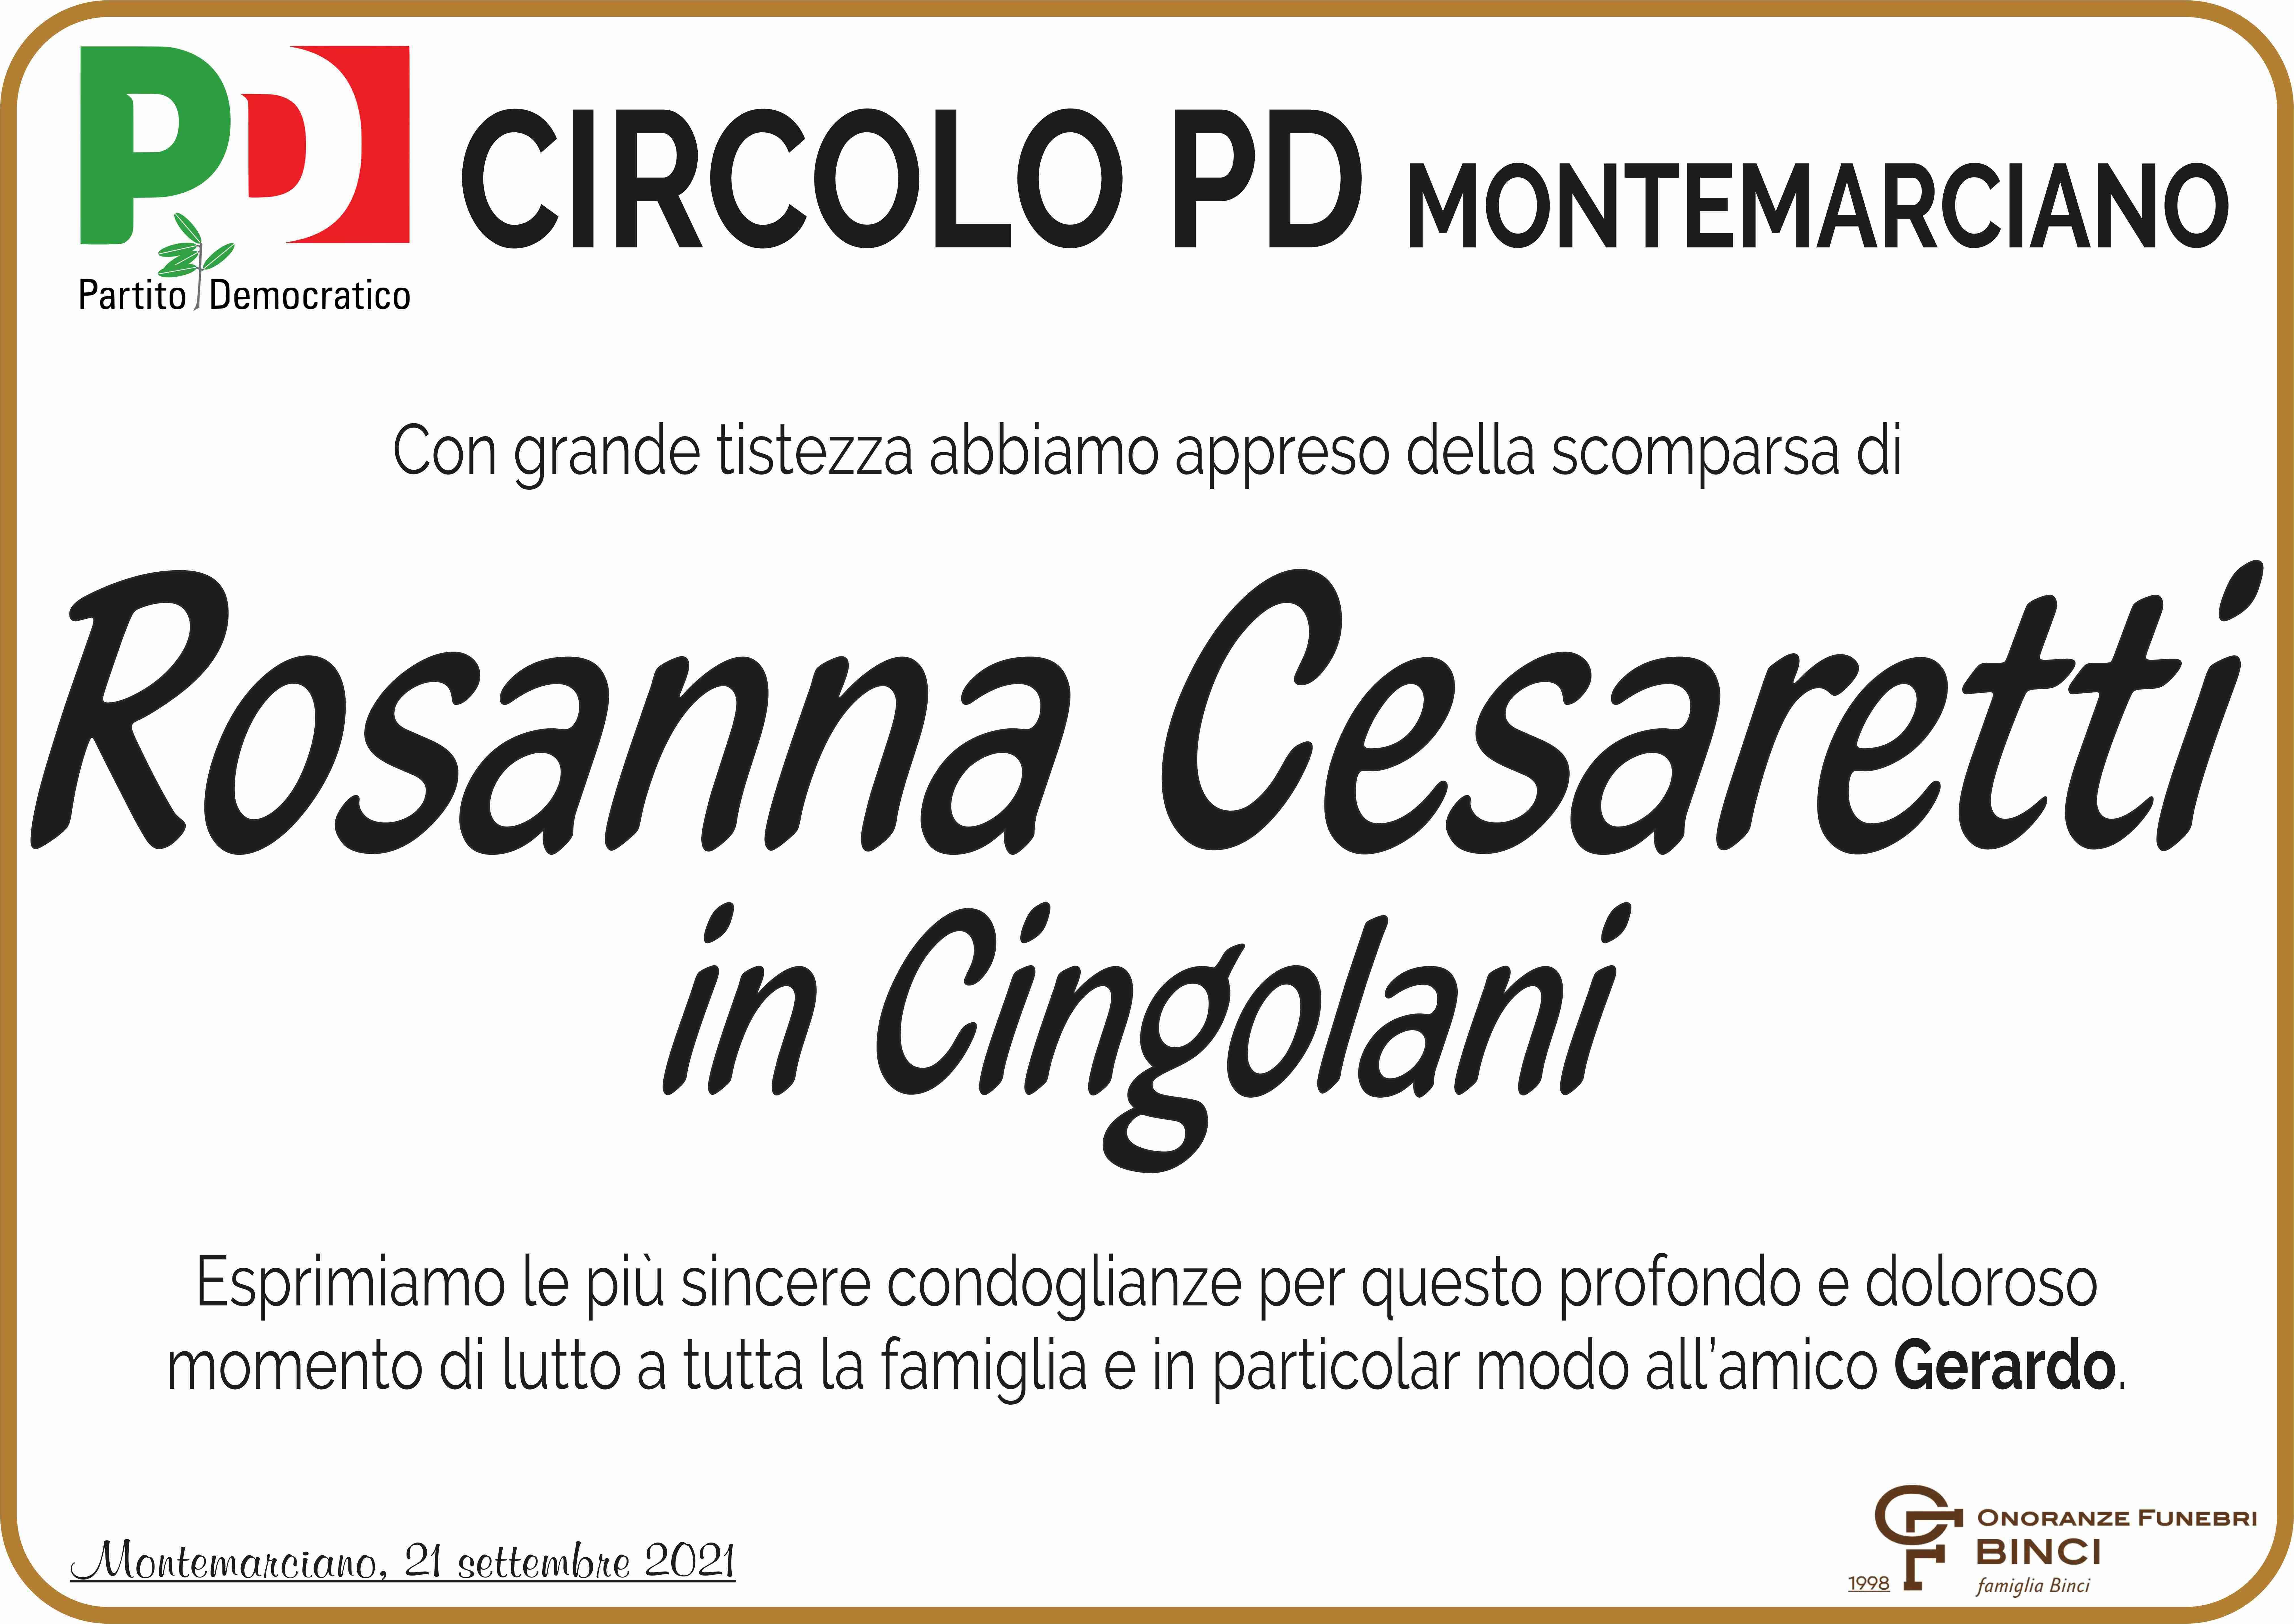 Rosanna Cesaretti